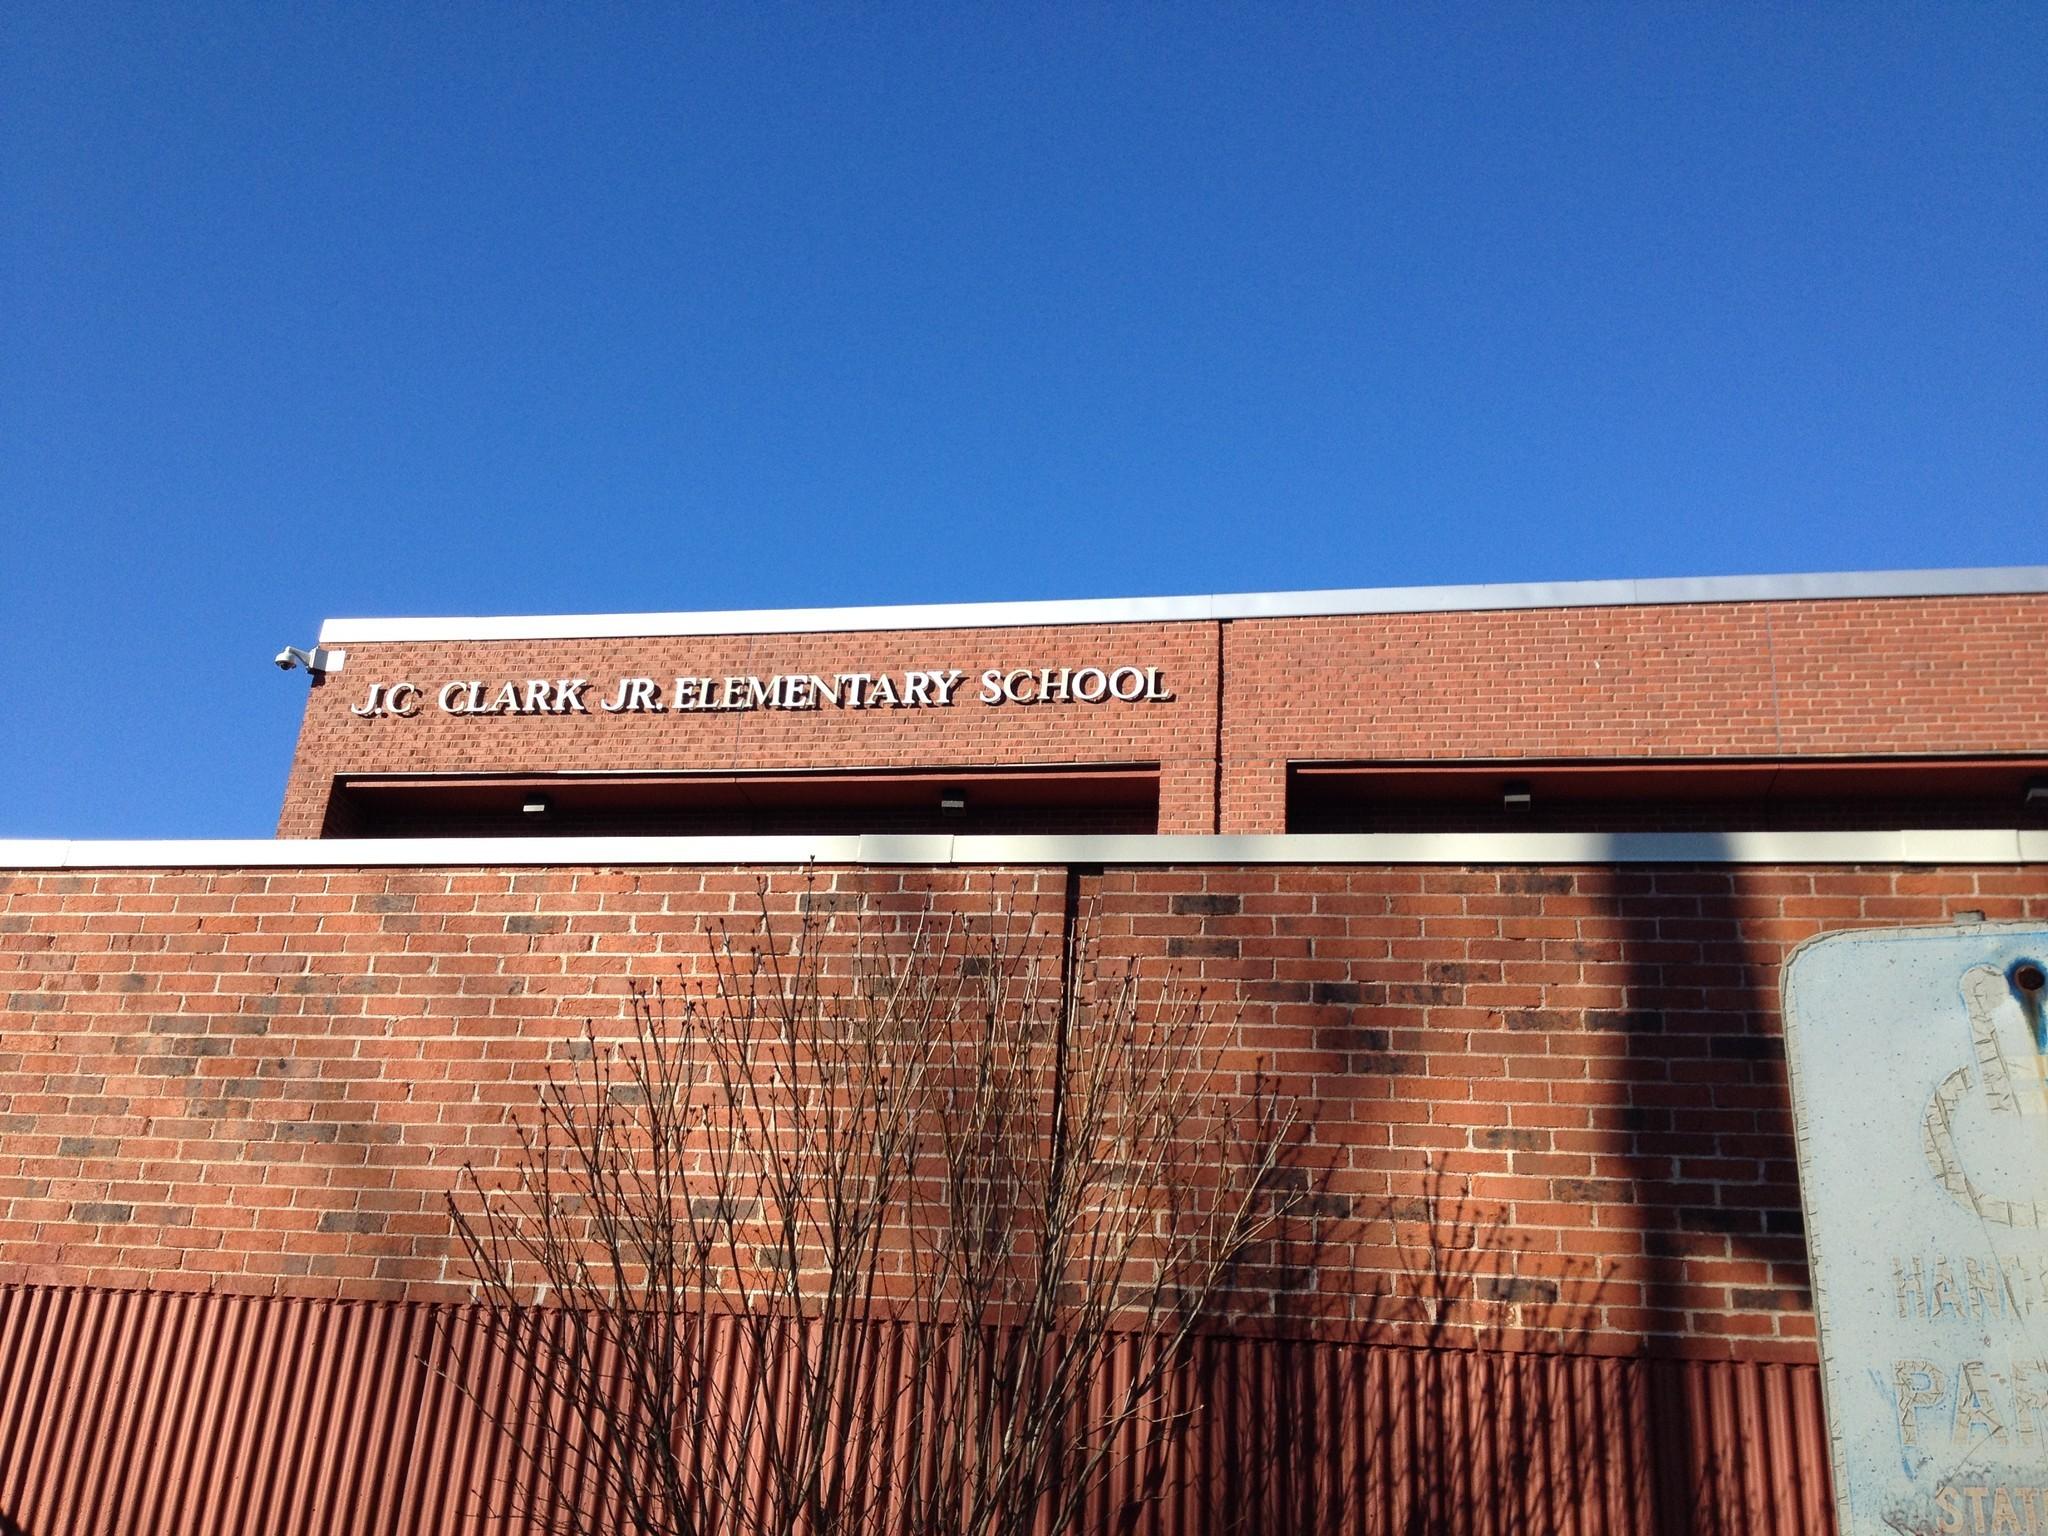 Pcb Caulking In Buildings : Report contaminated caulk at hartford school well above